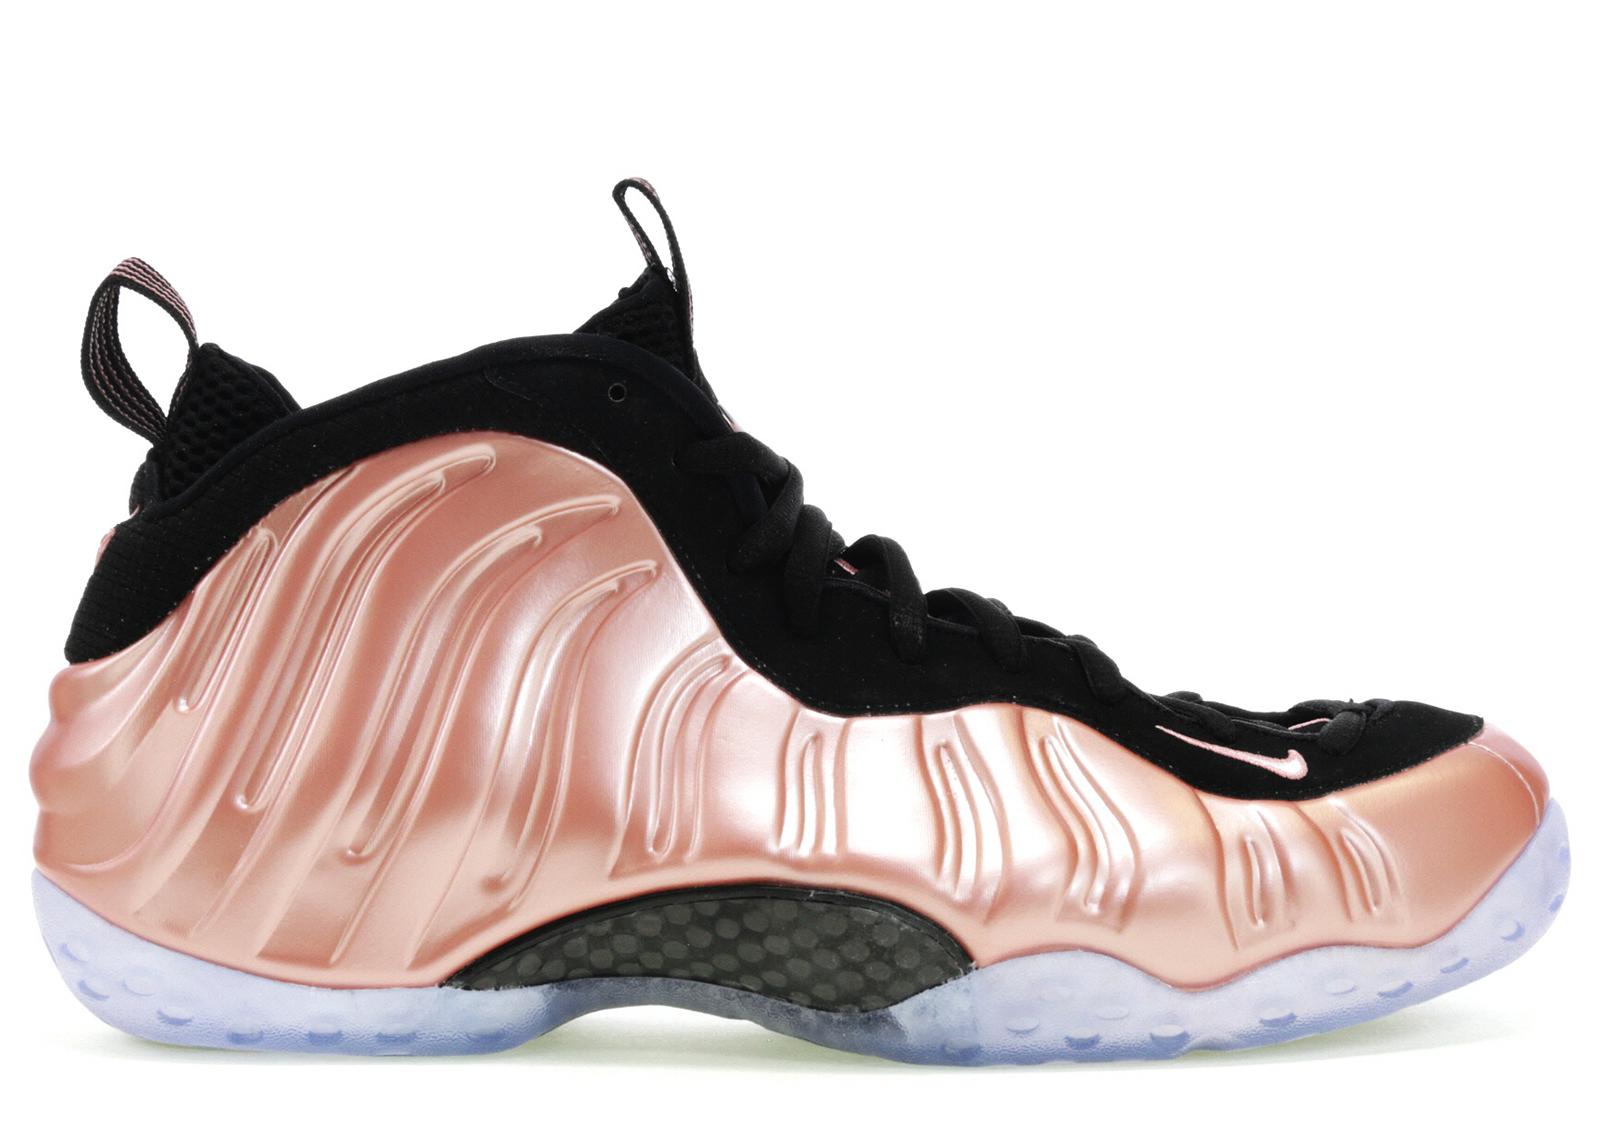 Nike Air Foamposite One Rust Pink